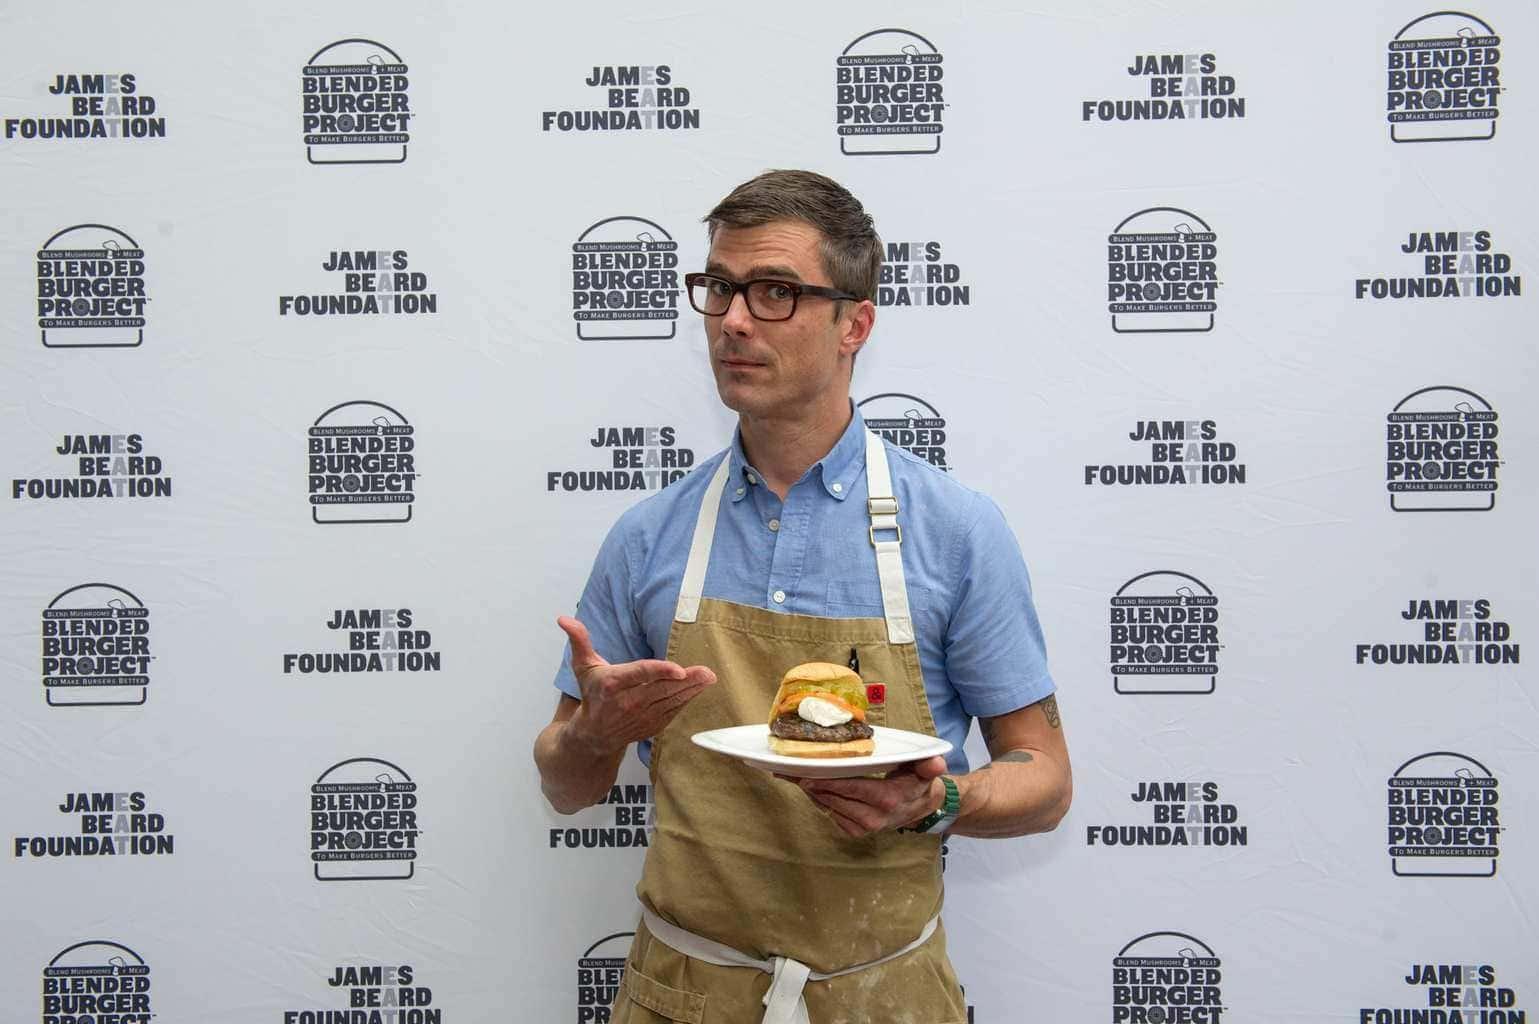 James Beard Foundation's Blended Burger Project